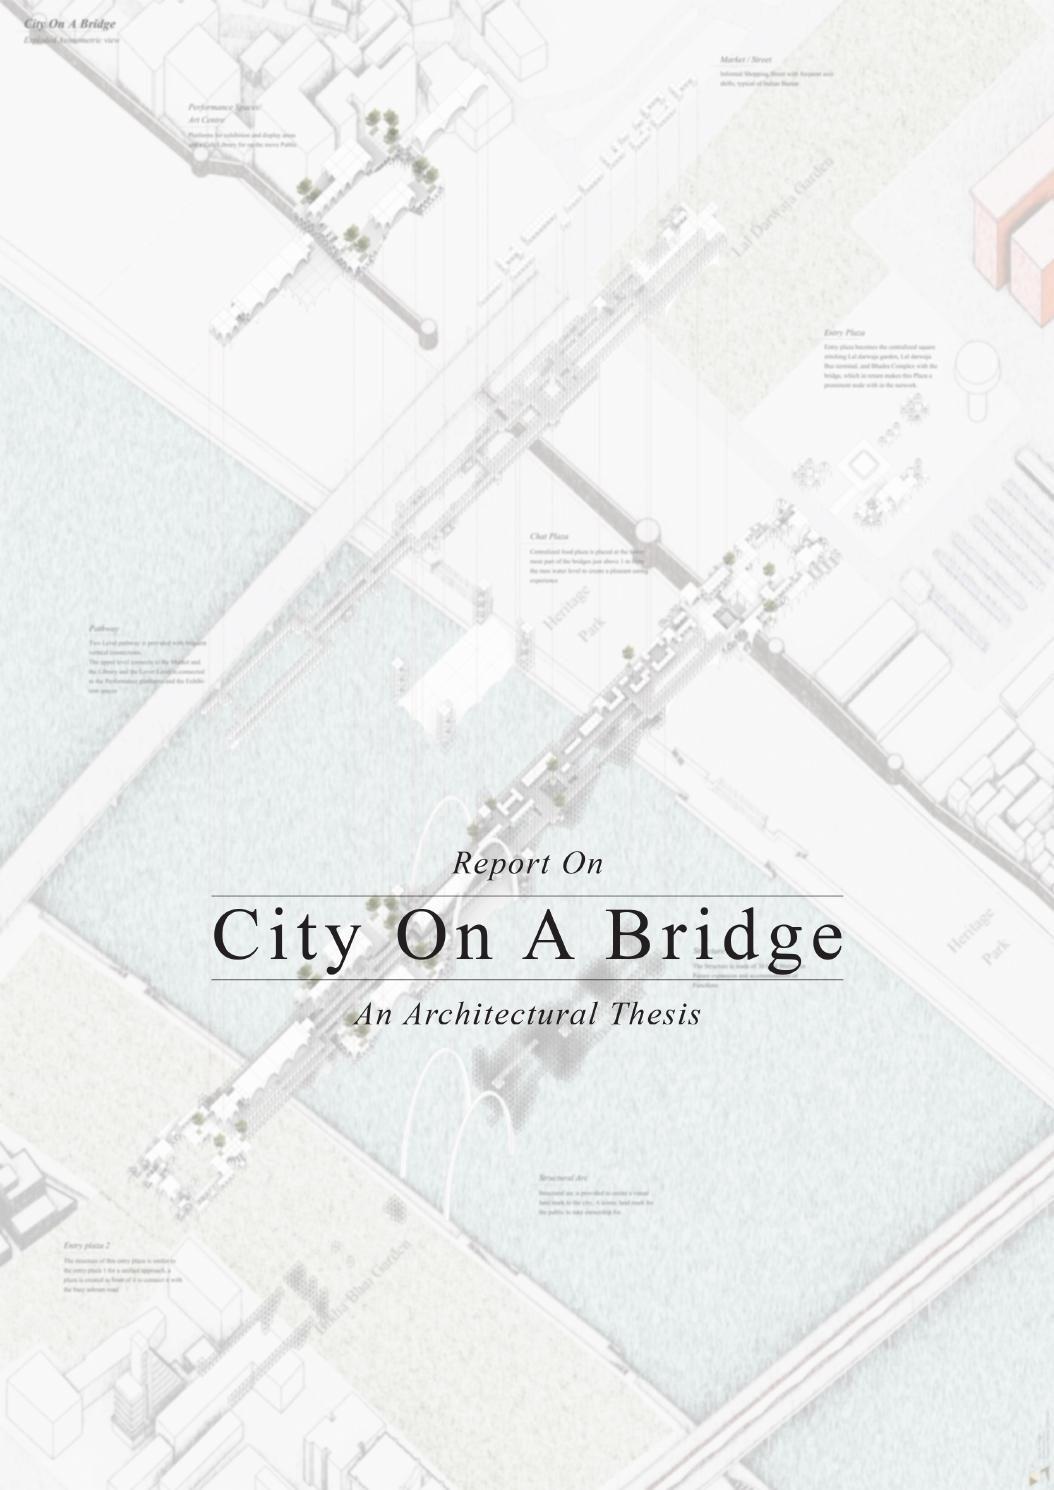 City On A Bridge Thesi Report Architectural Architecture Illustration Interior Dissertation Topics